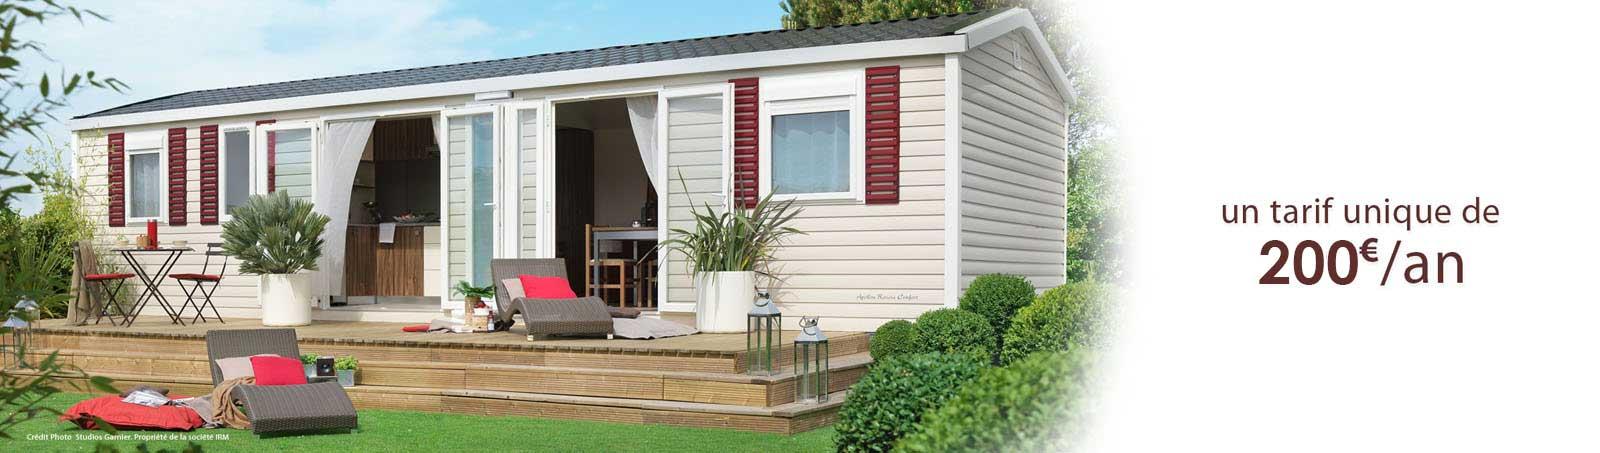 Assurance mobilhome tolede mobilhome for Annulation contrat assurance habitation